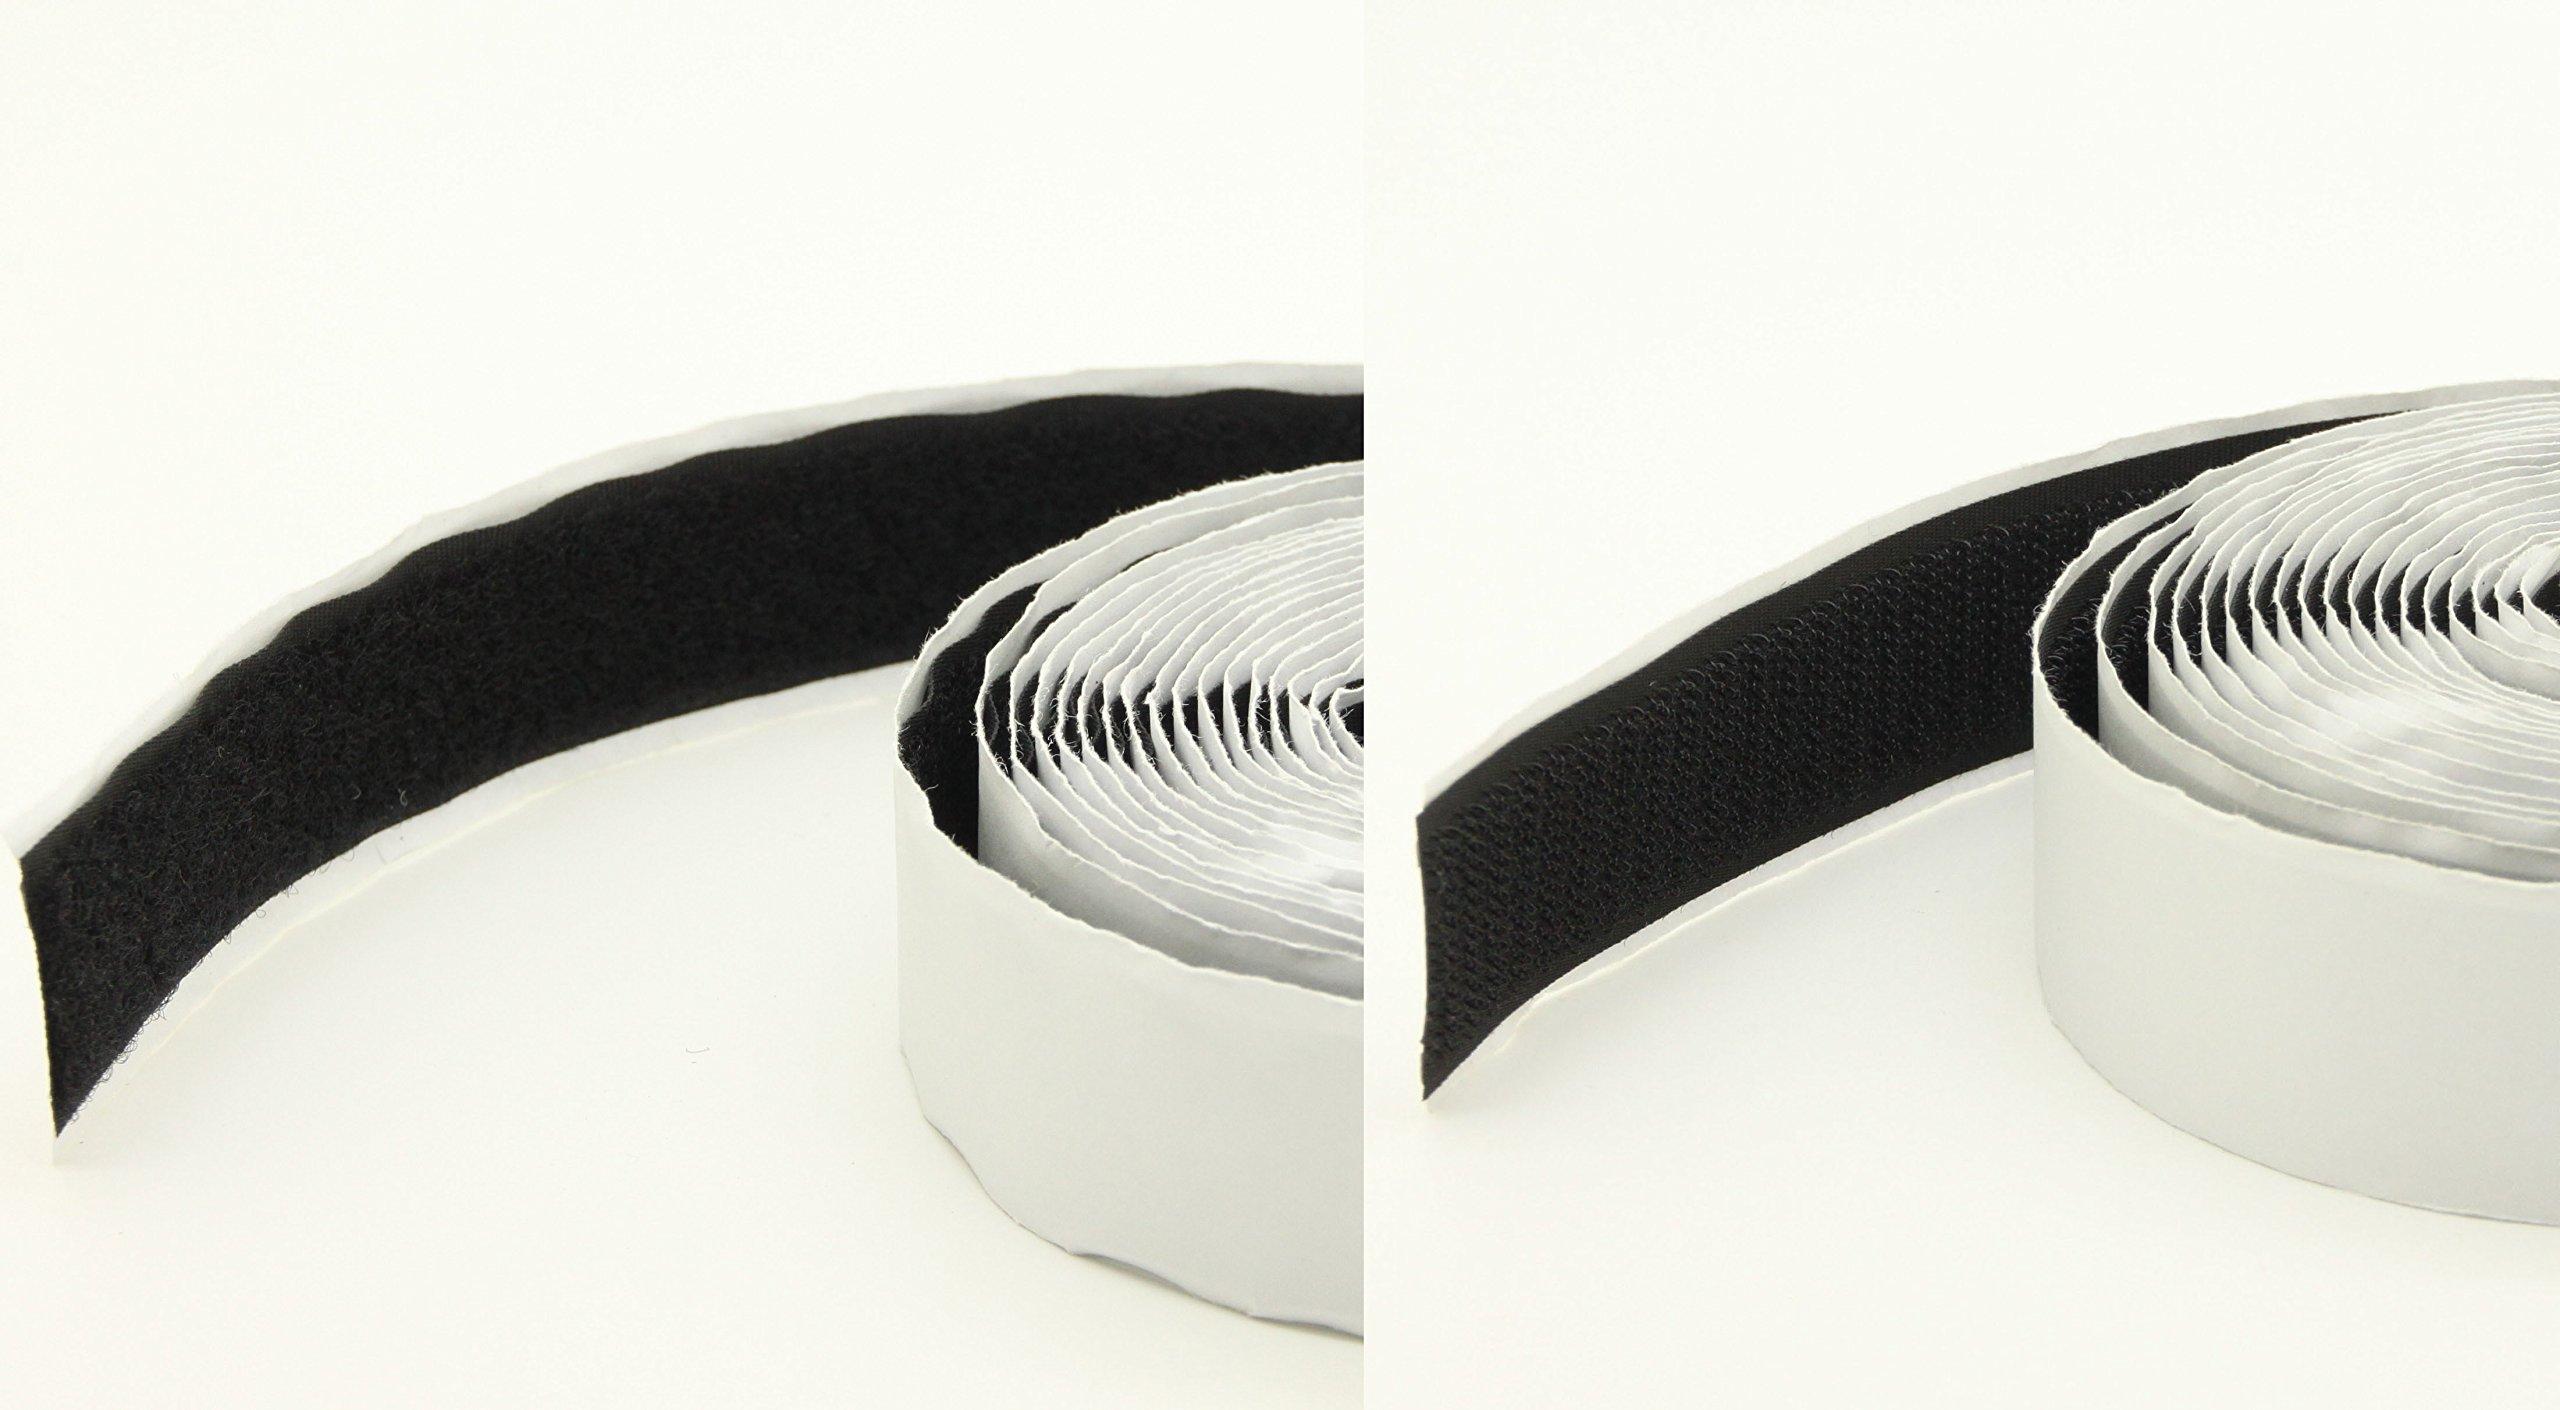 FixtureDisplays Set of 2 Pcs 15 Feet 1'' Black Self Adhesive Hook & Loop Tape Fastener101731 101731!